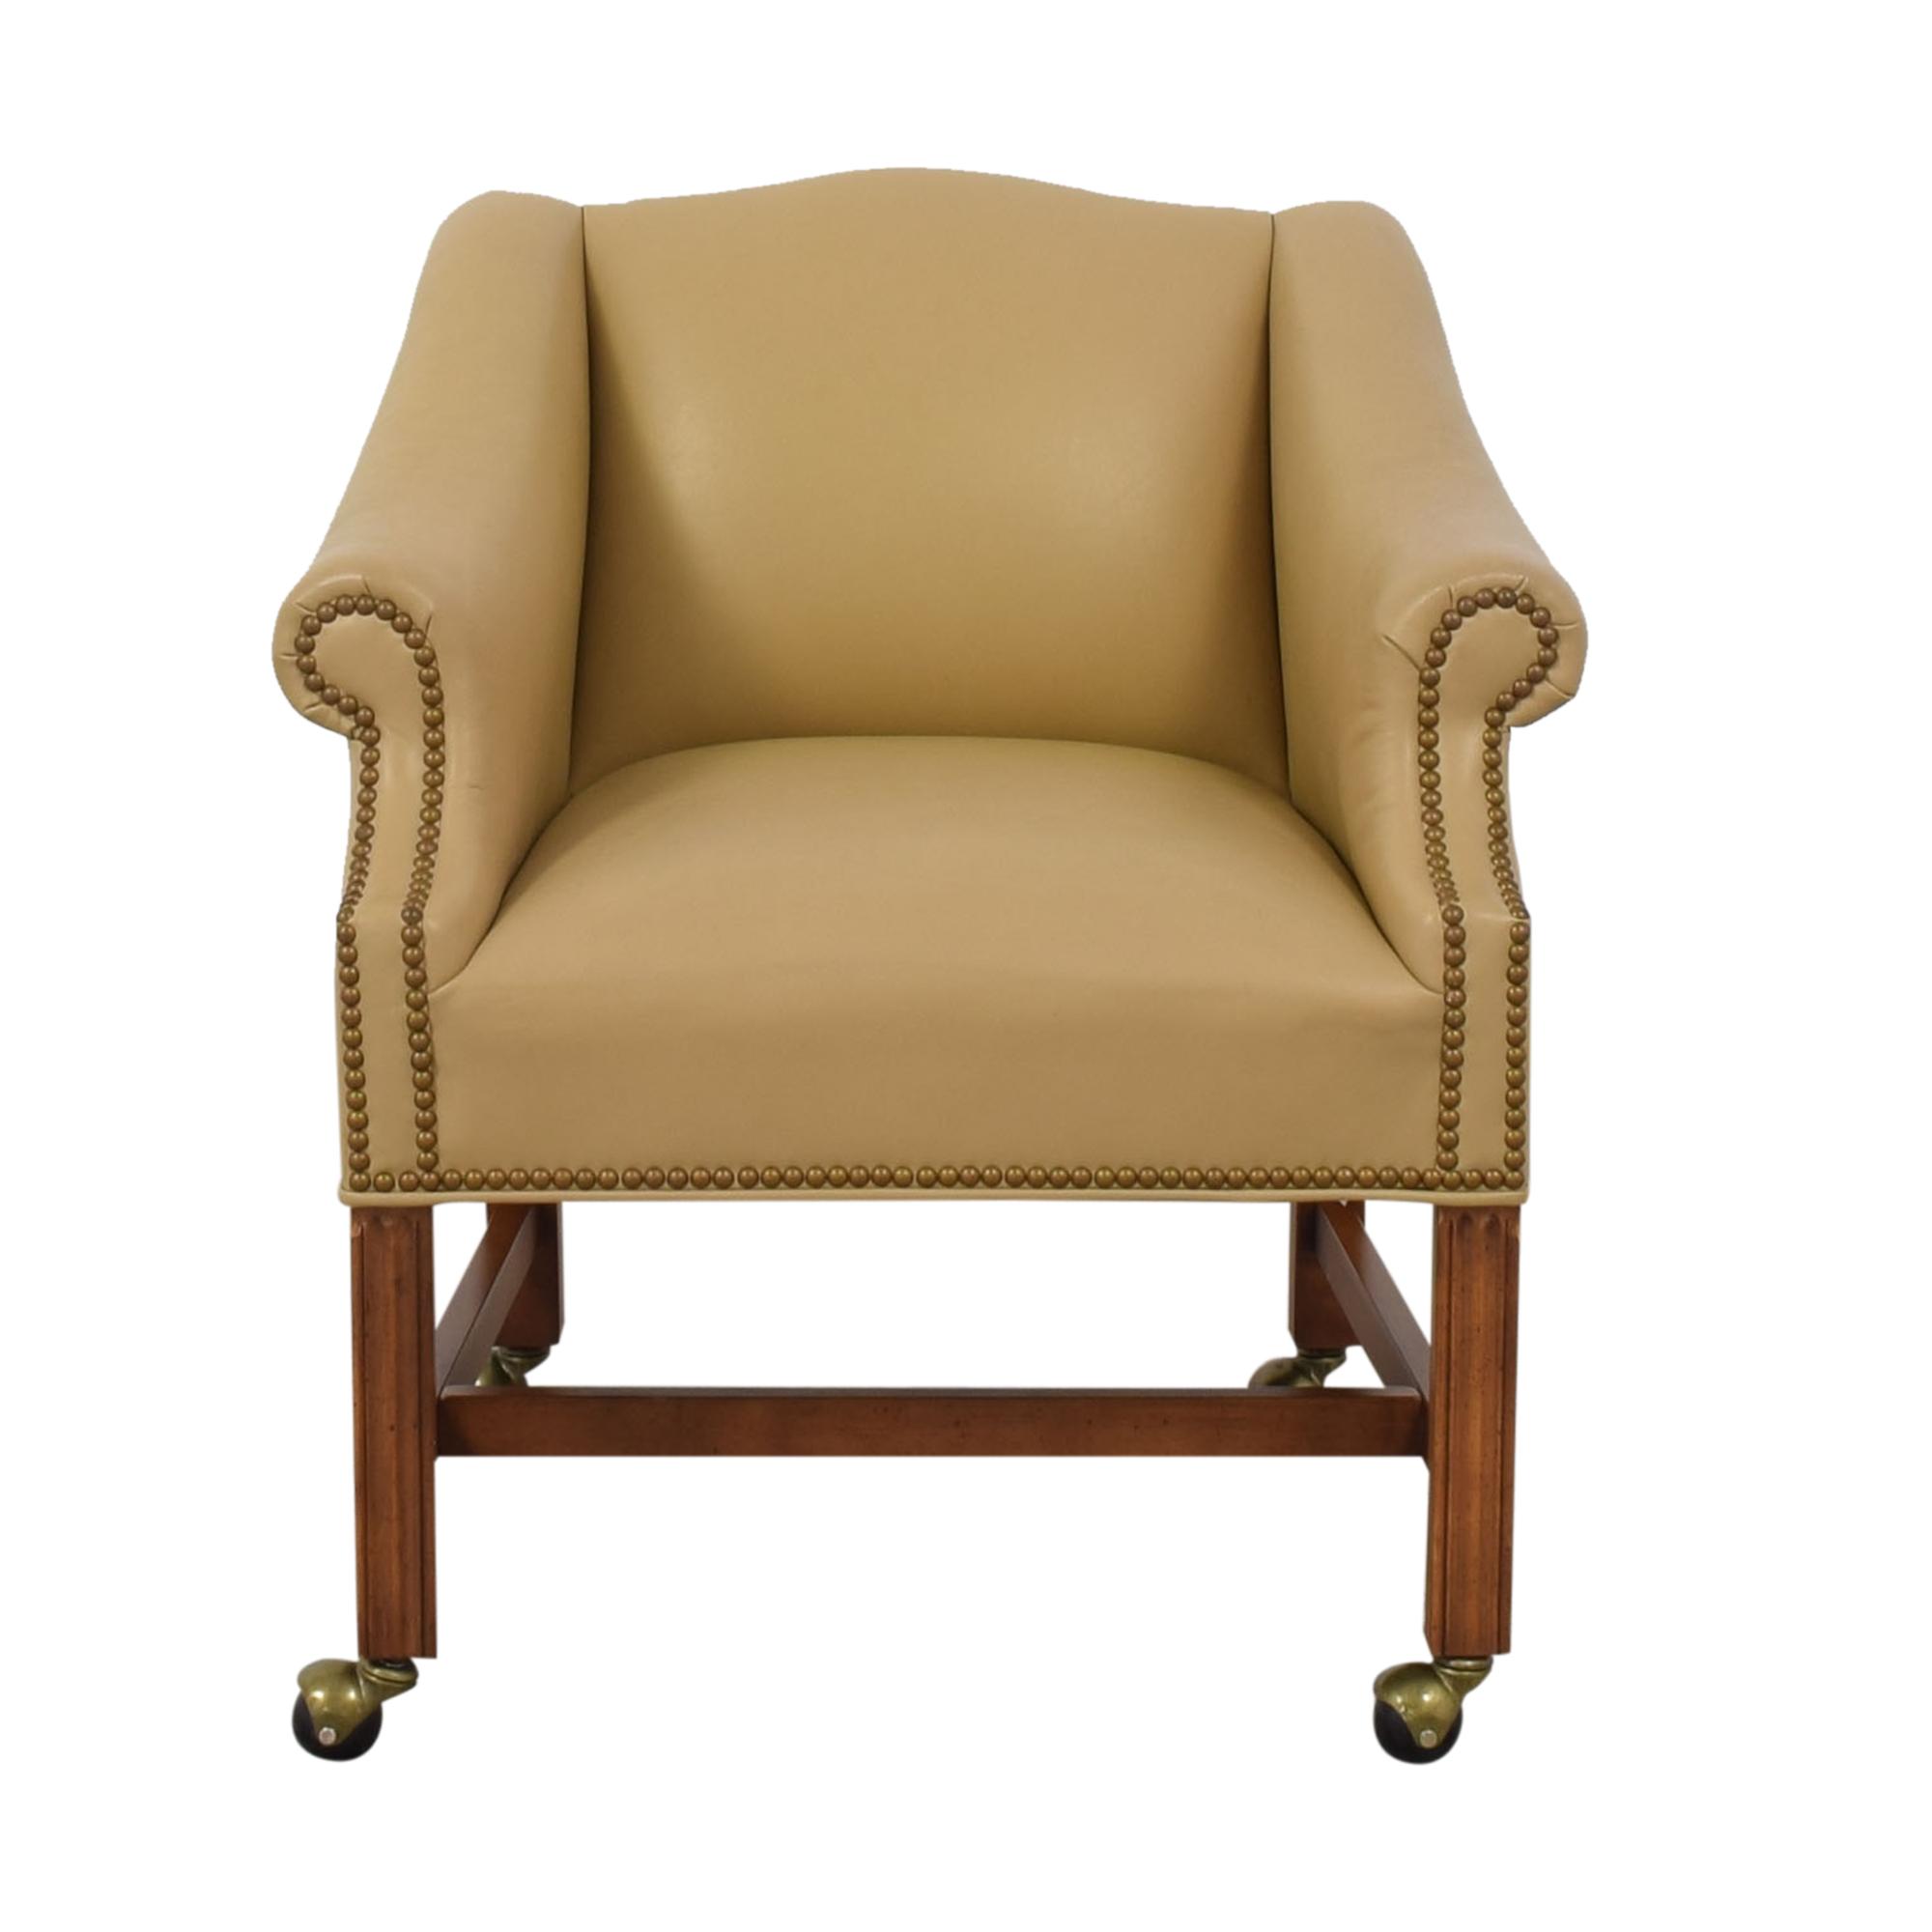 buy McKinley Leather Furniture McKinley Nailhead Office Chair online